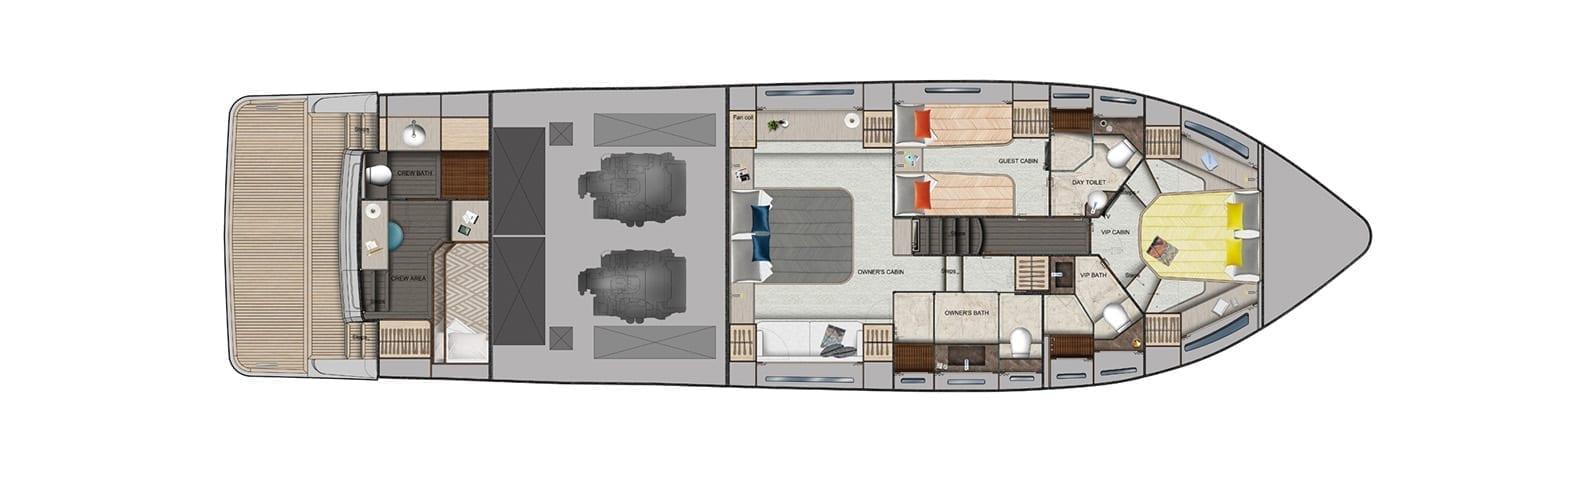 Uniesse-Capri-6-footprint3